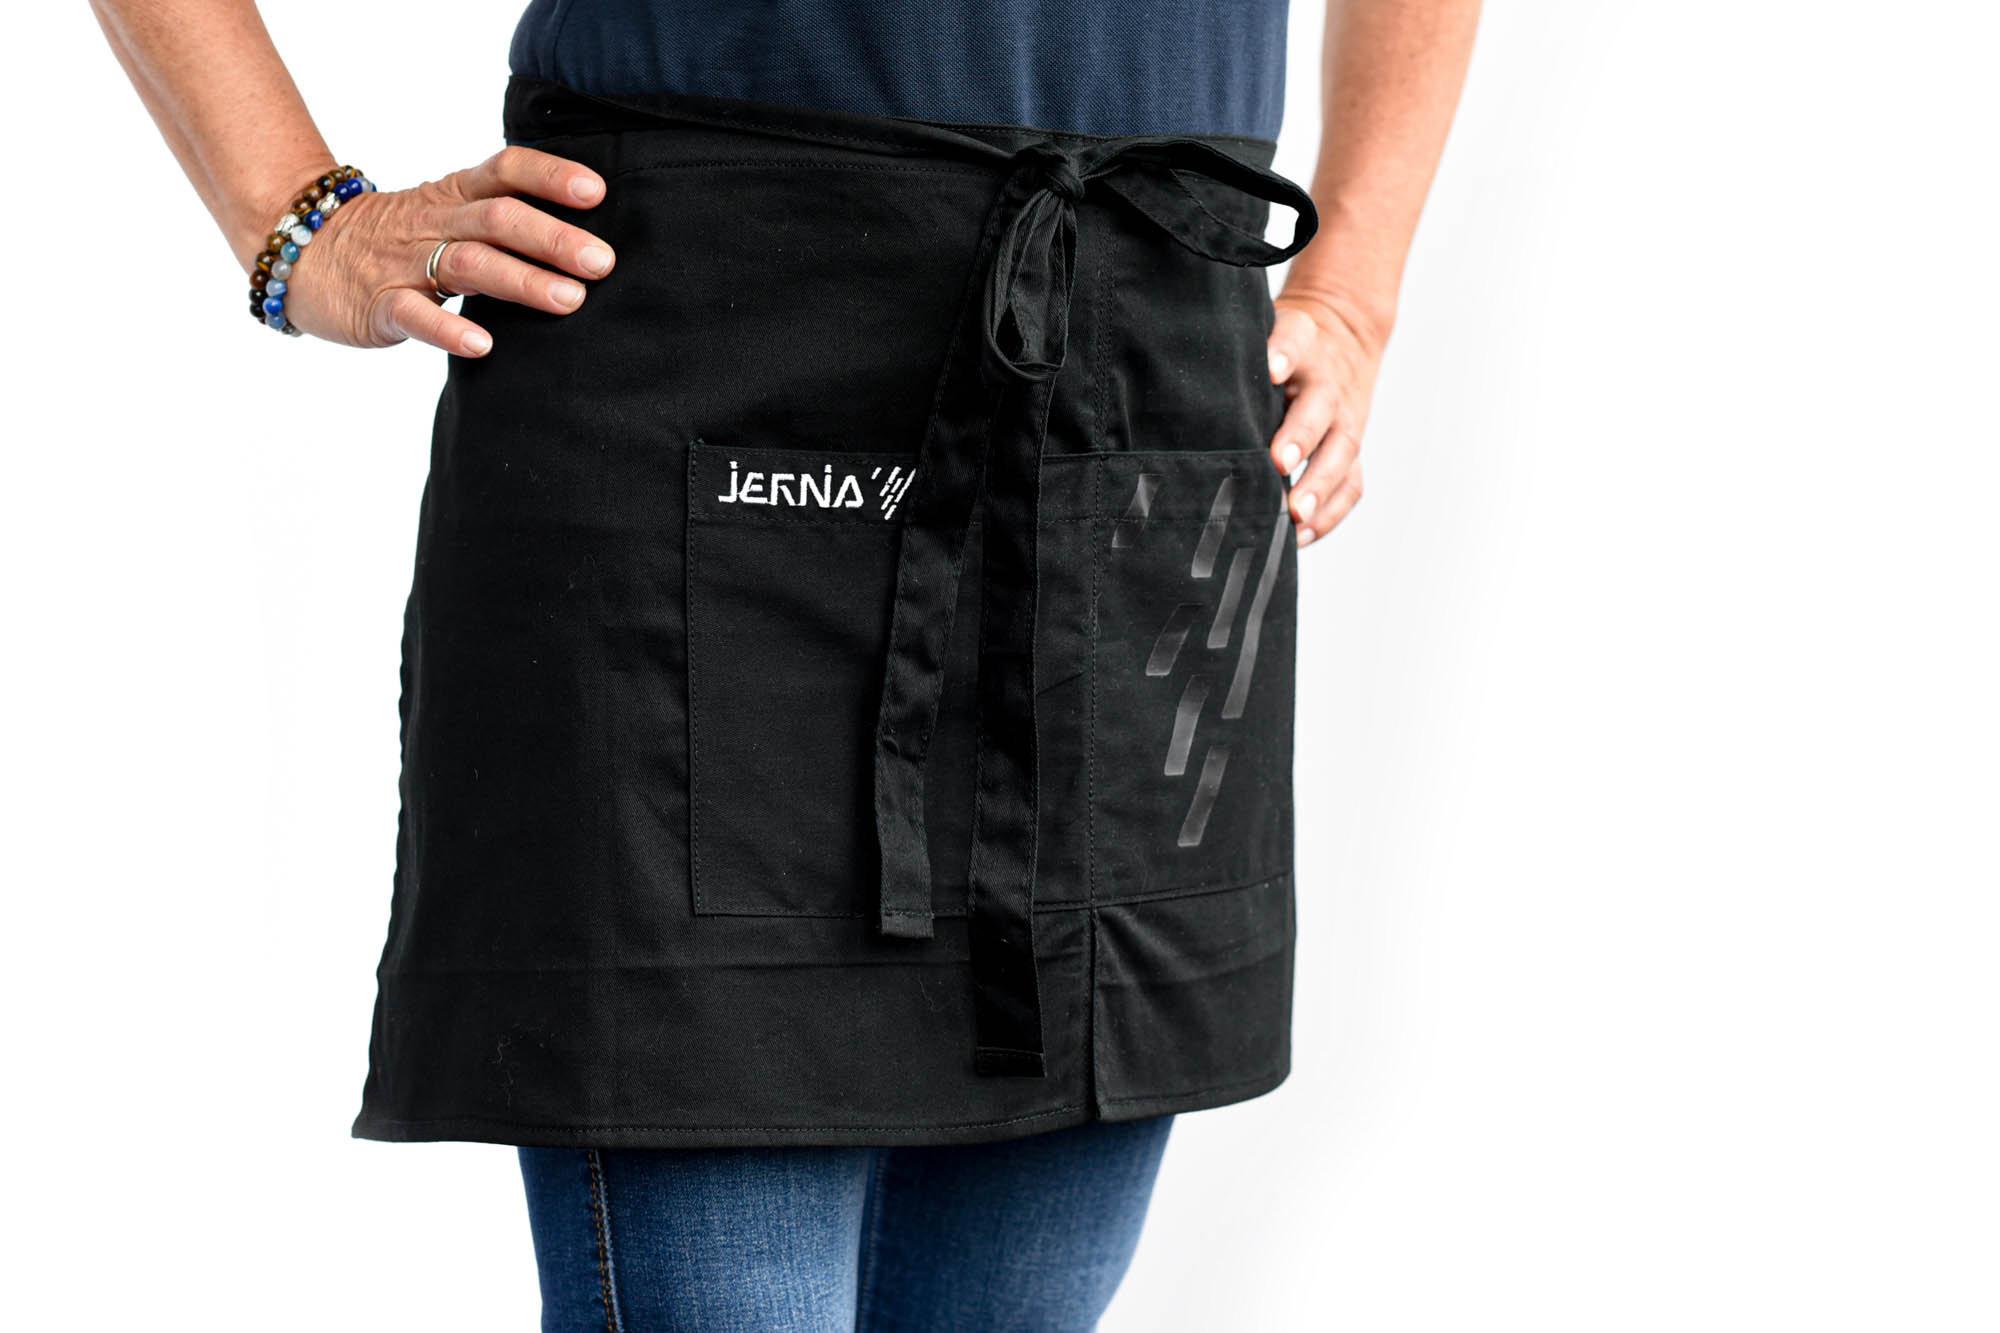 Jernia uniform